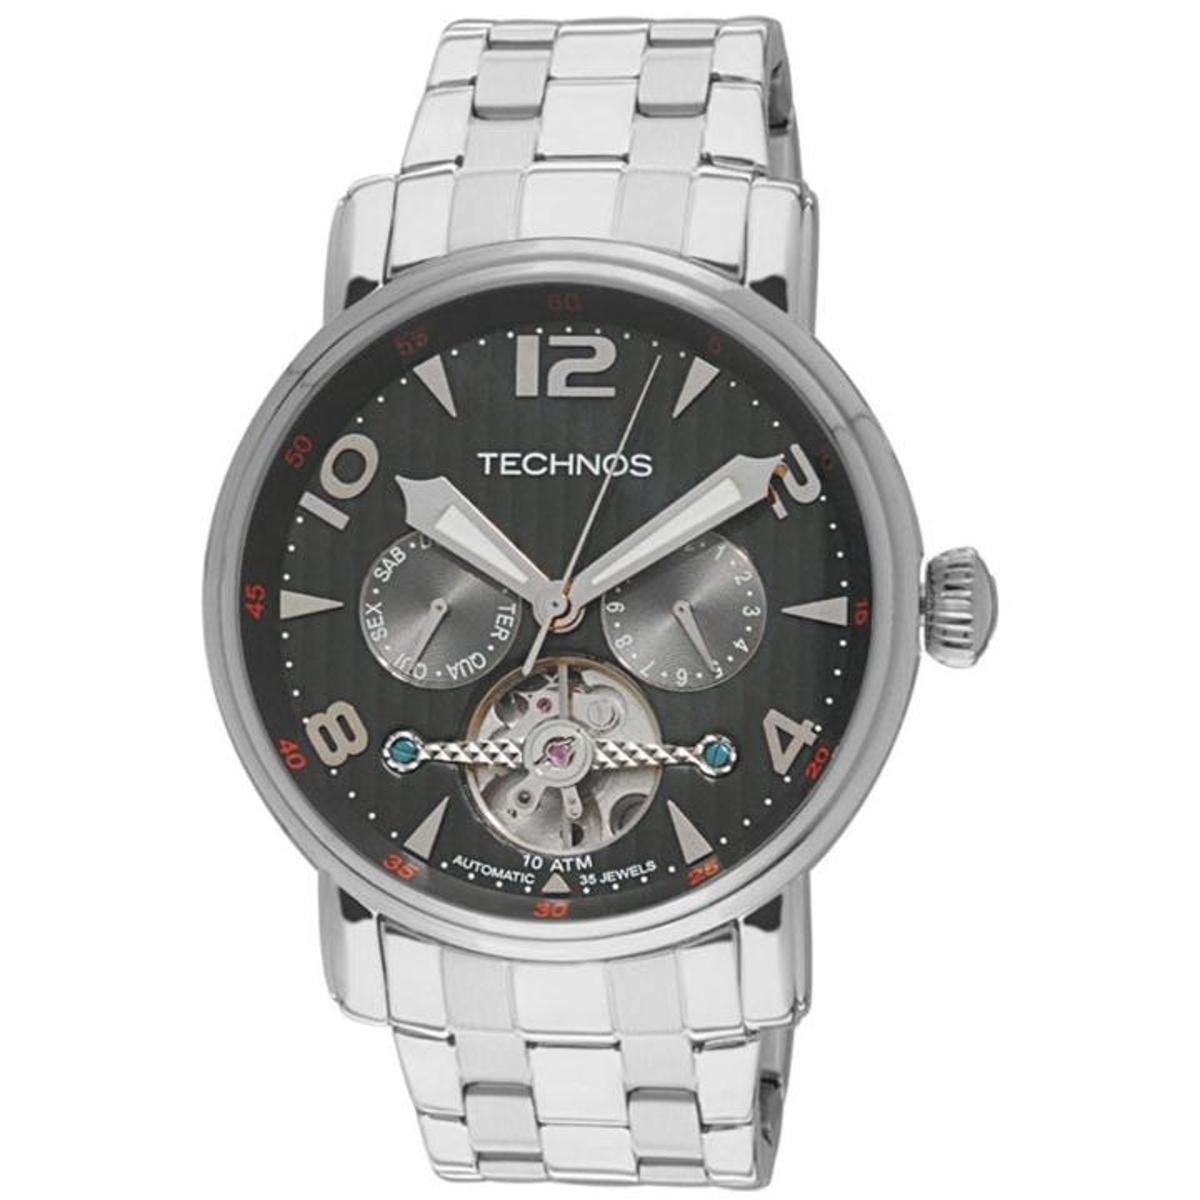 fbfdfb4dab8 Relógio Technos Automático 35 Jewels 2L27AA 1P - Compre Agora